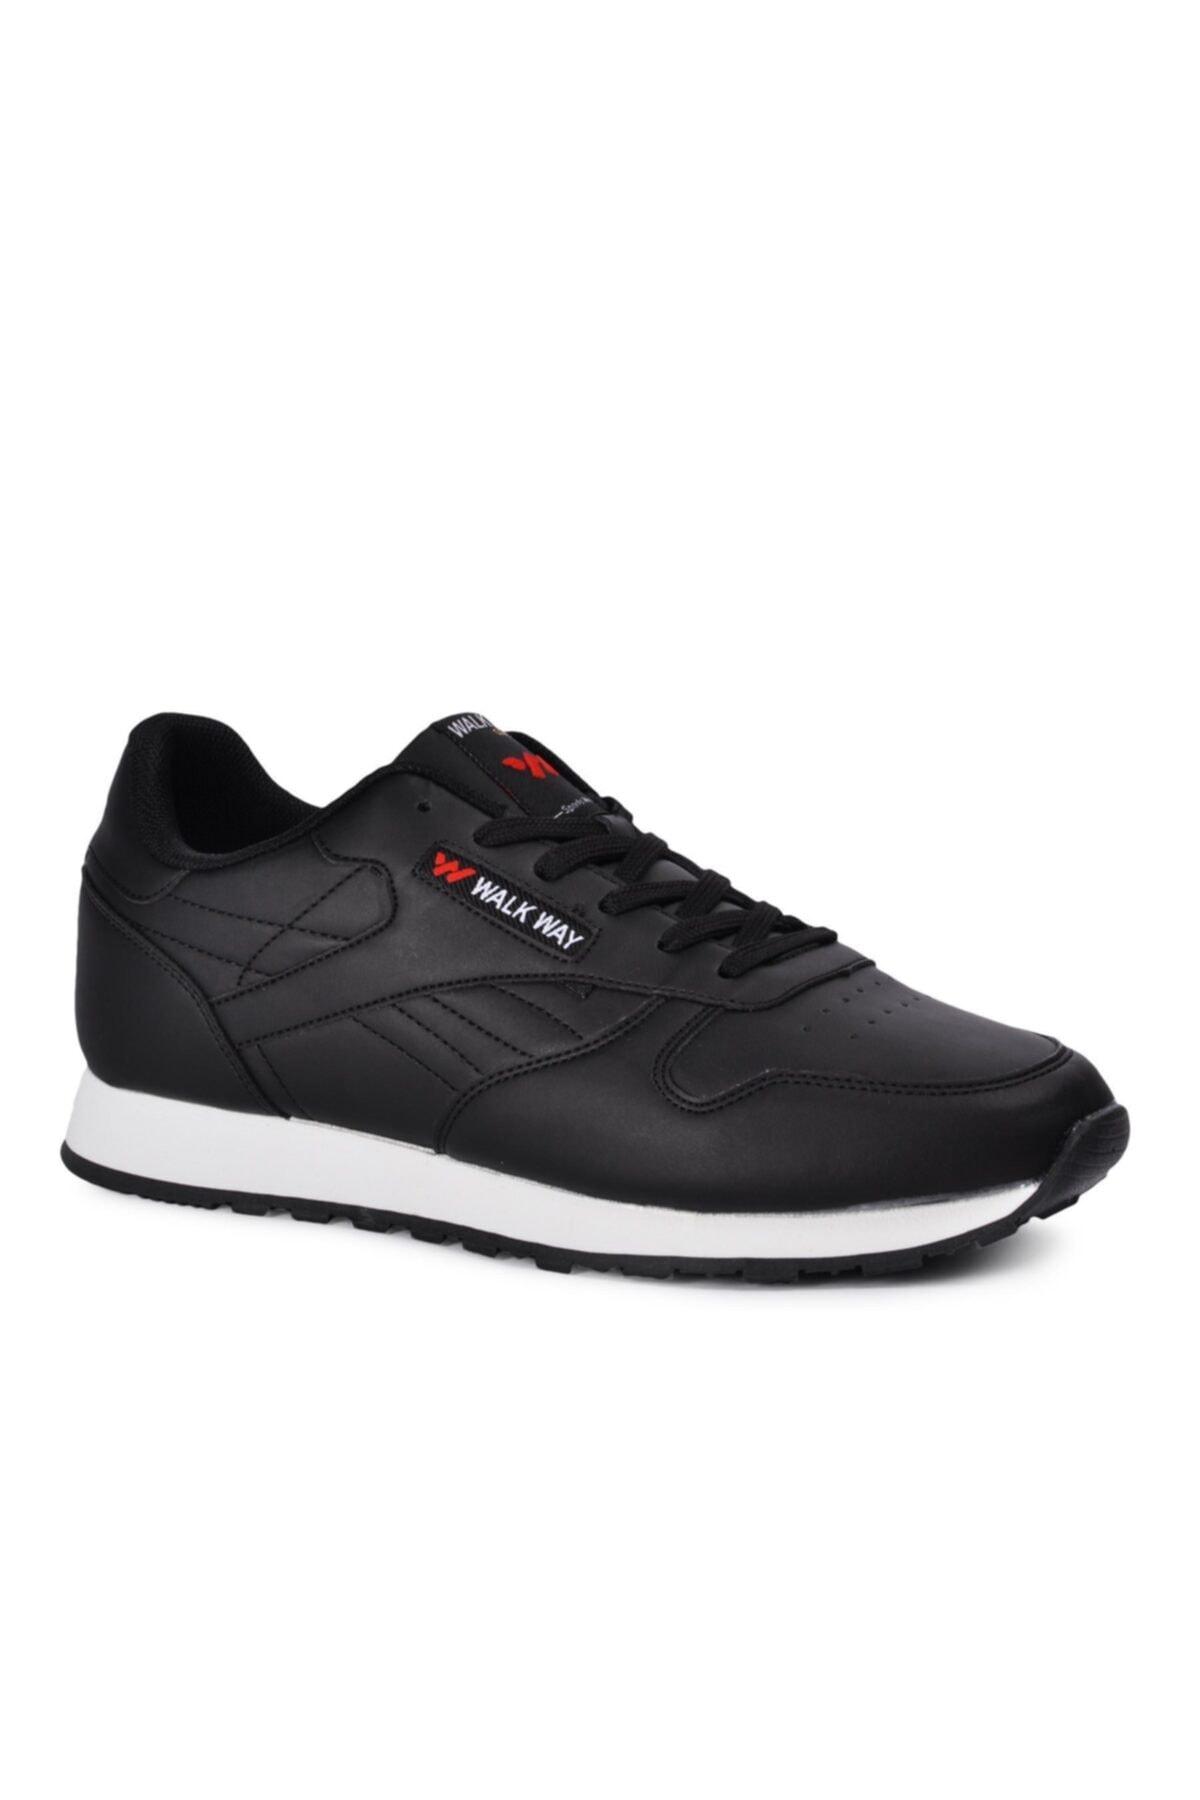 WALKWAY Memory Foam Siyah Beyaz Erkek Spor Ayakkabı Wlk23602 1